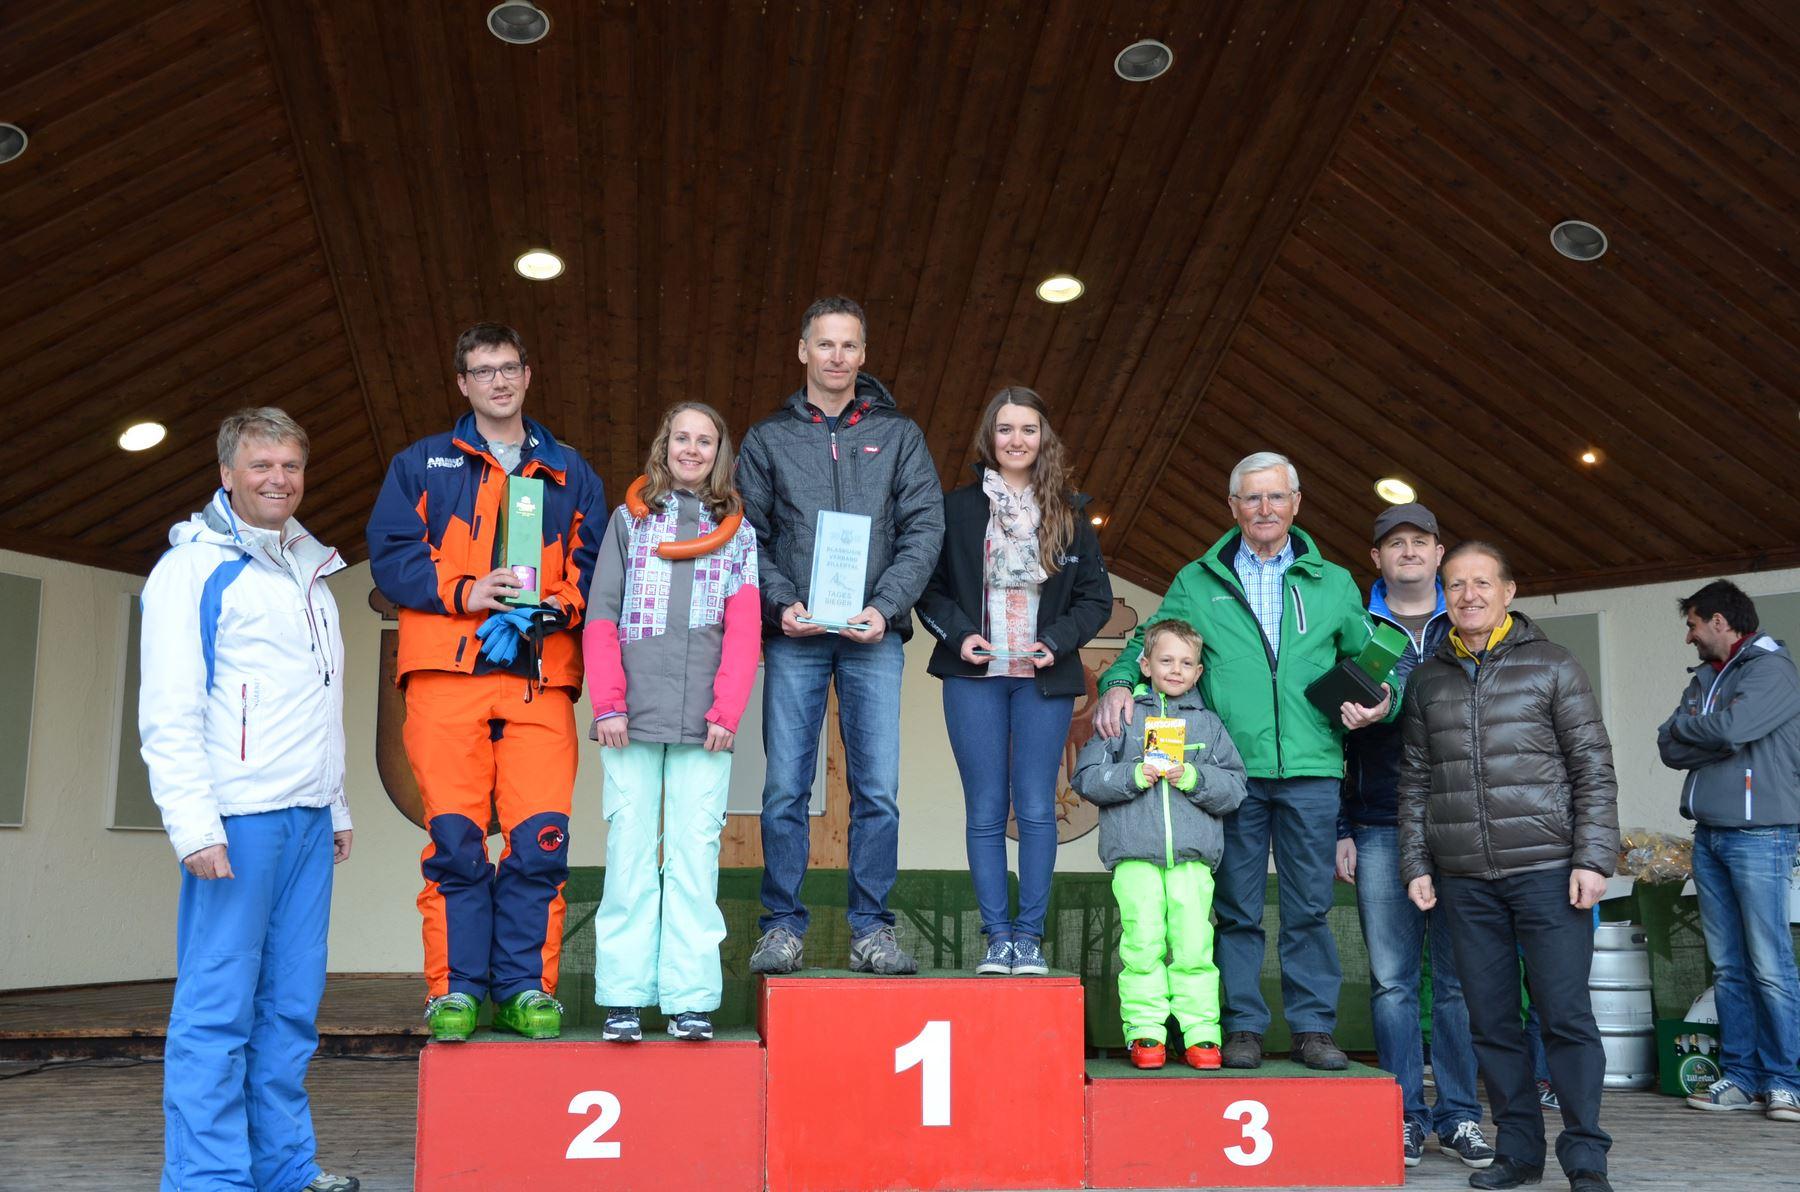 2015-03-22 BV Zillertal Skirennen 521.JPG